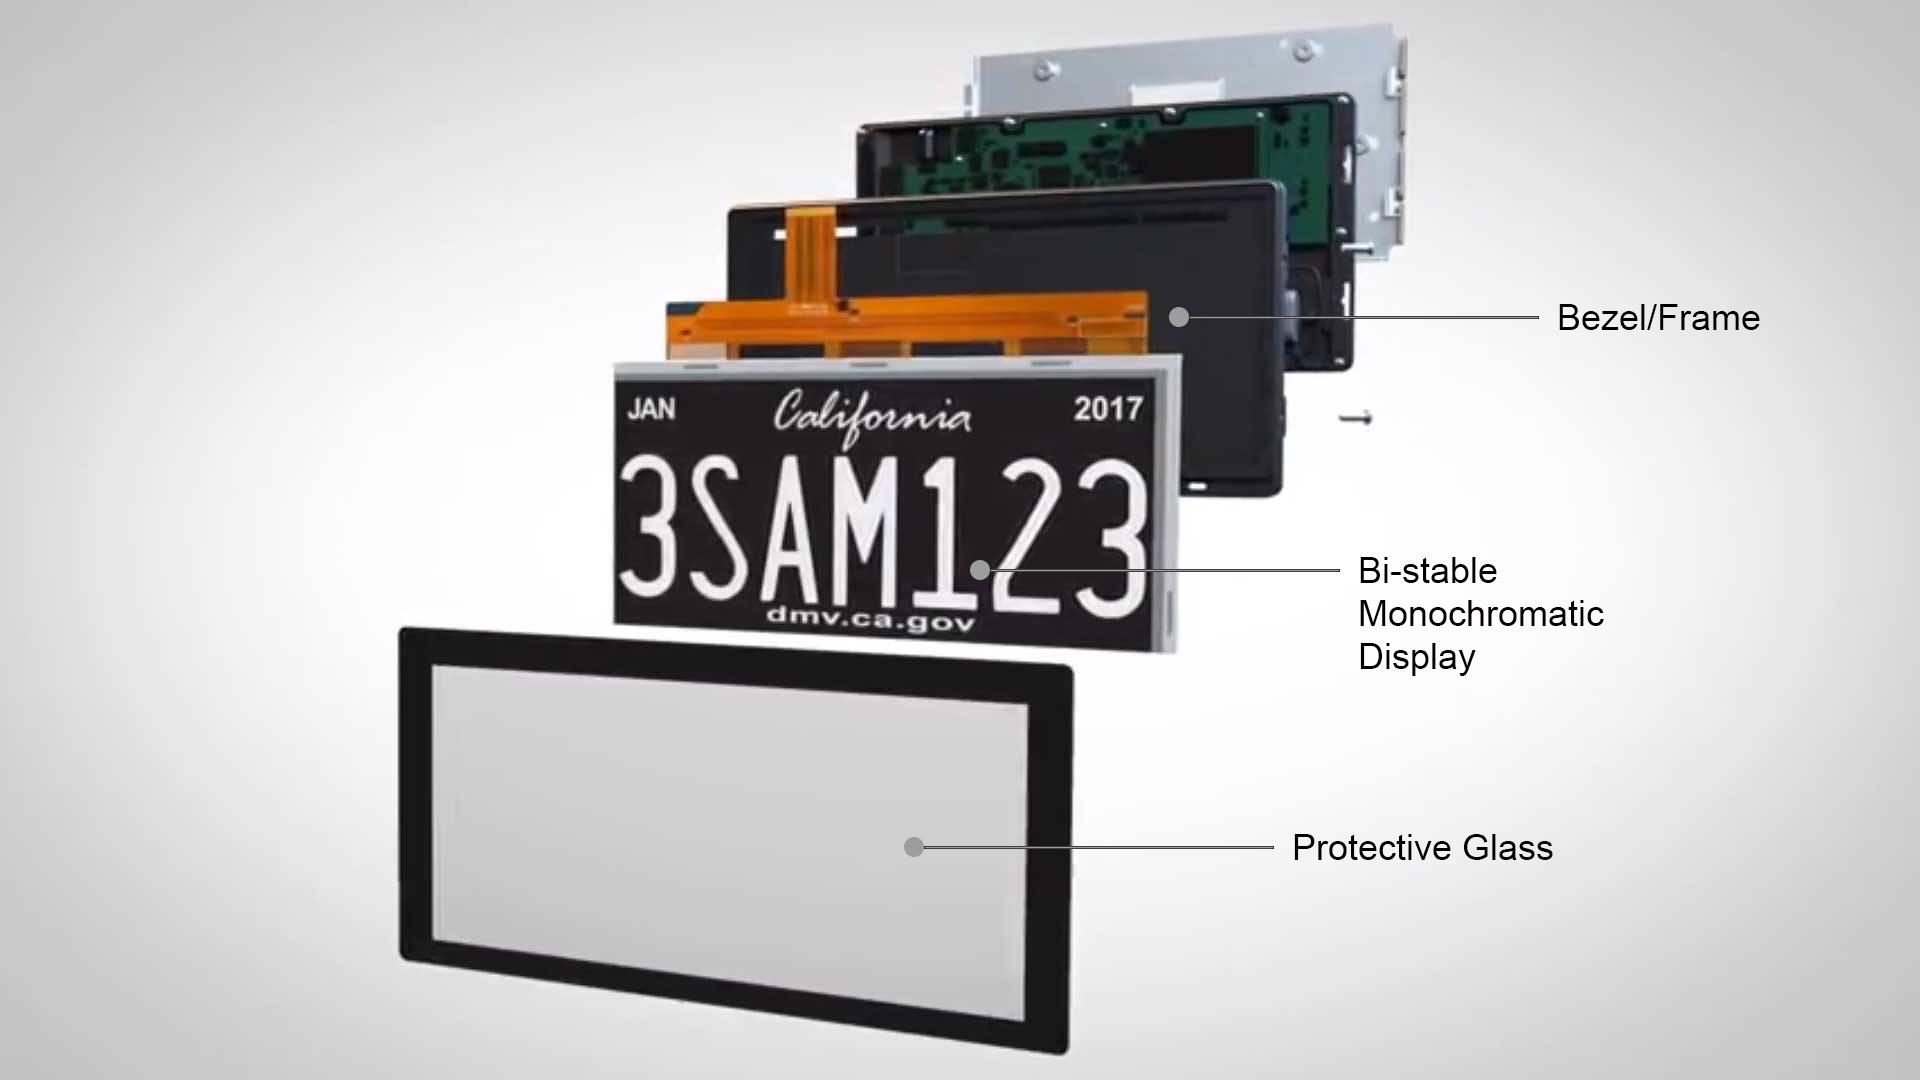 California Digital License Rplate Pro - Galpin Motors